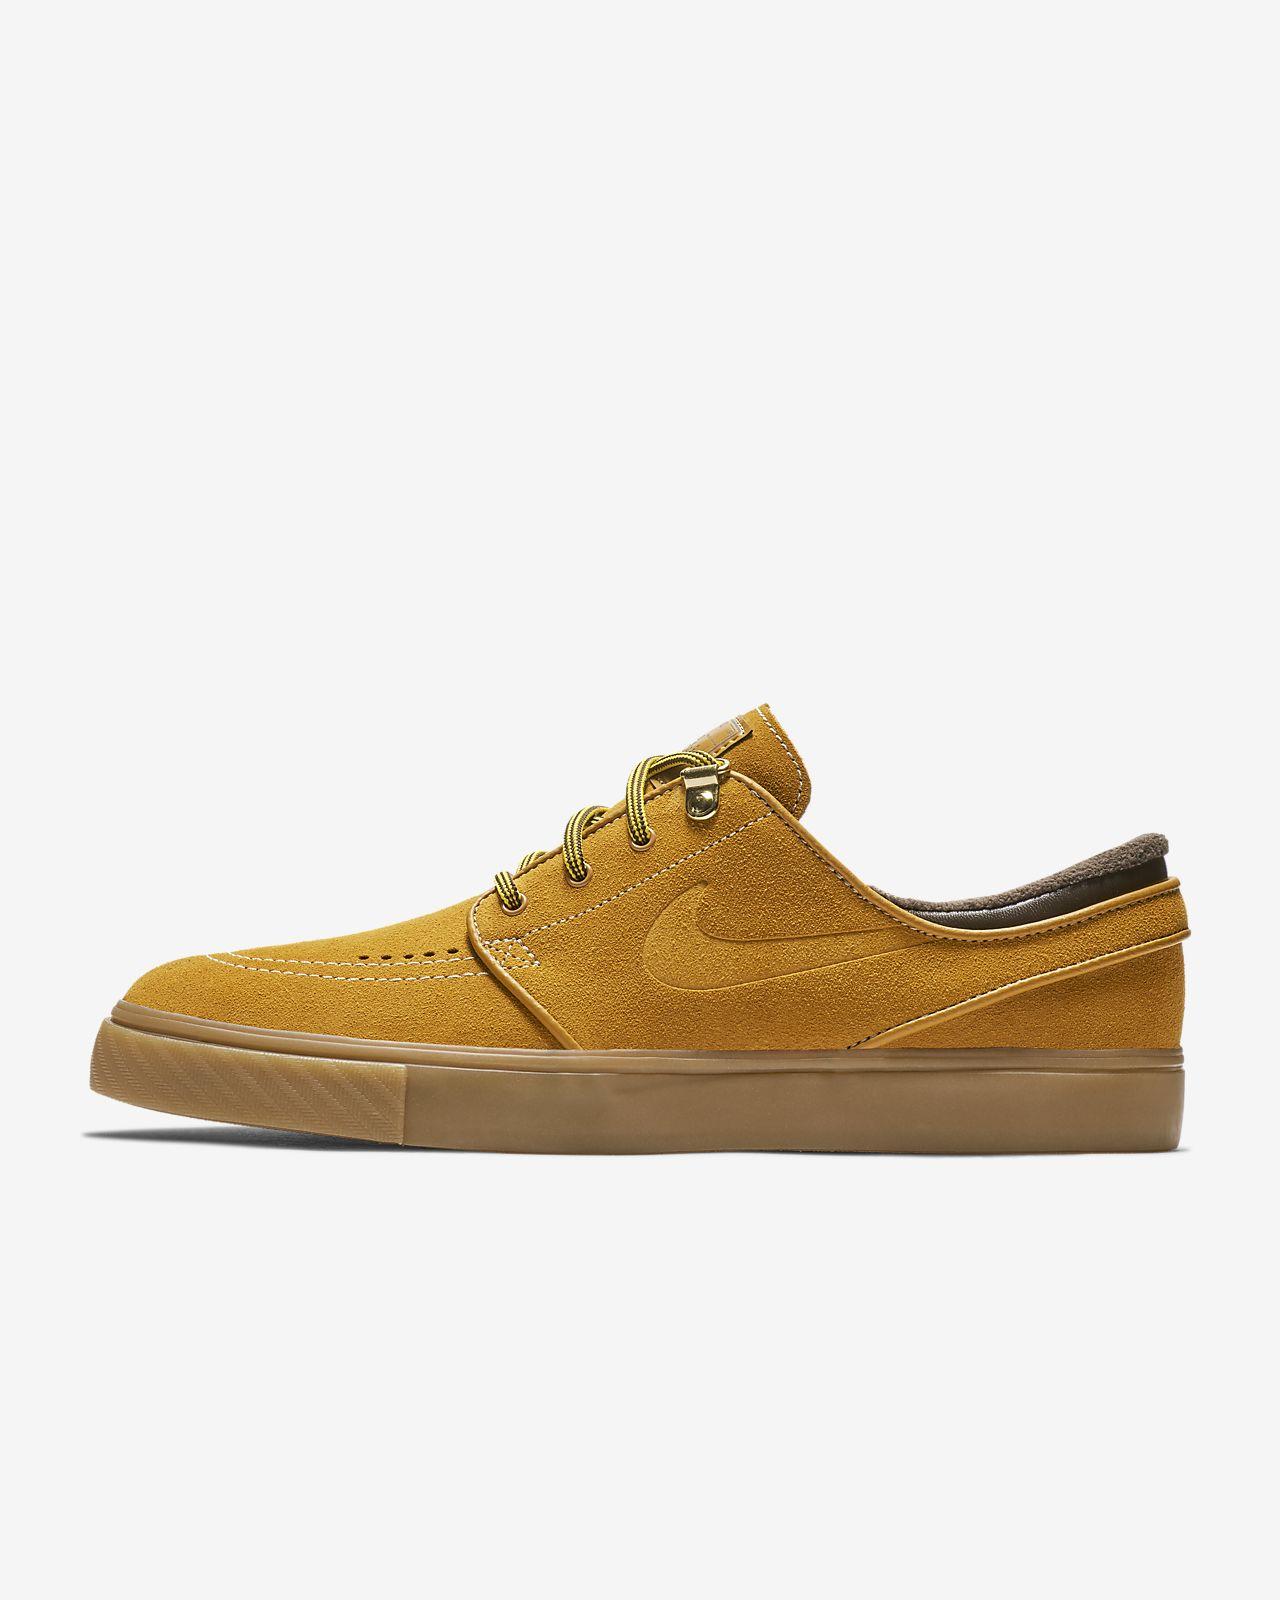 Nike SB Zoom Janoski Premium Skate Shoe